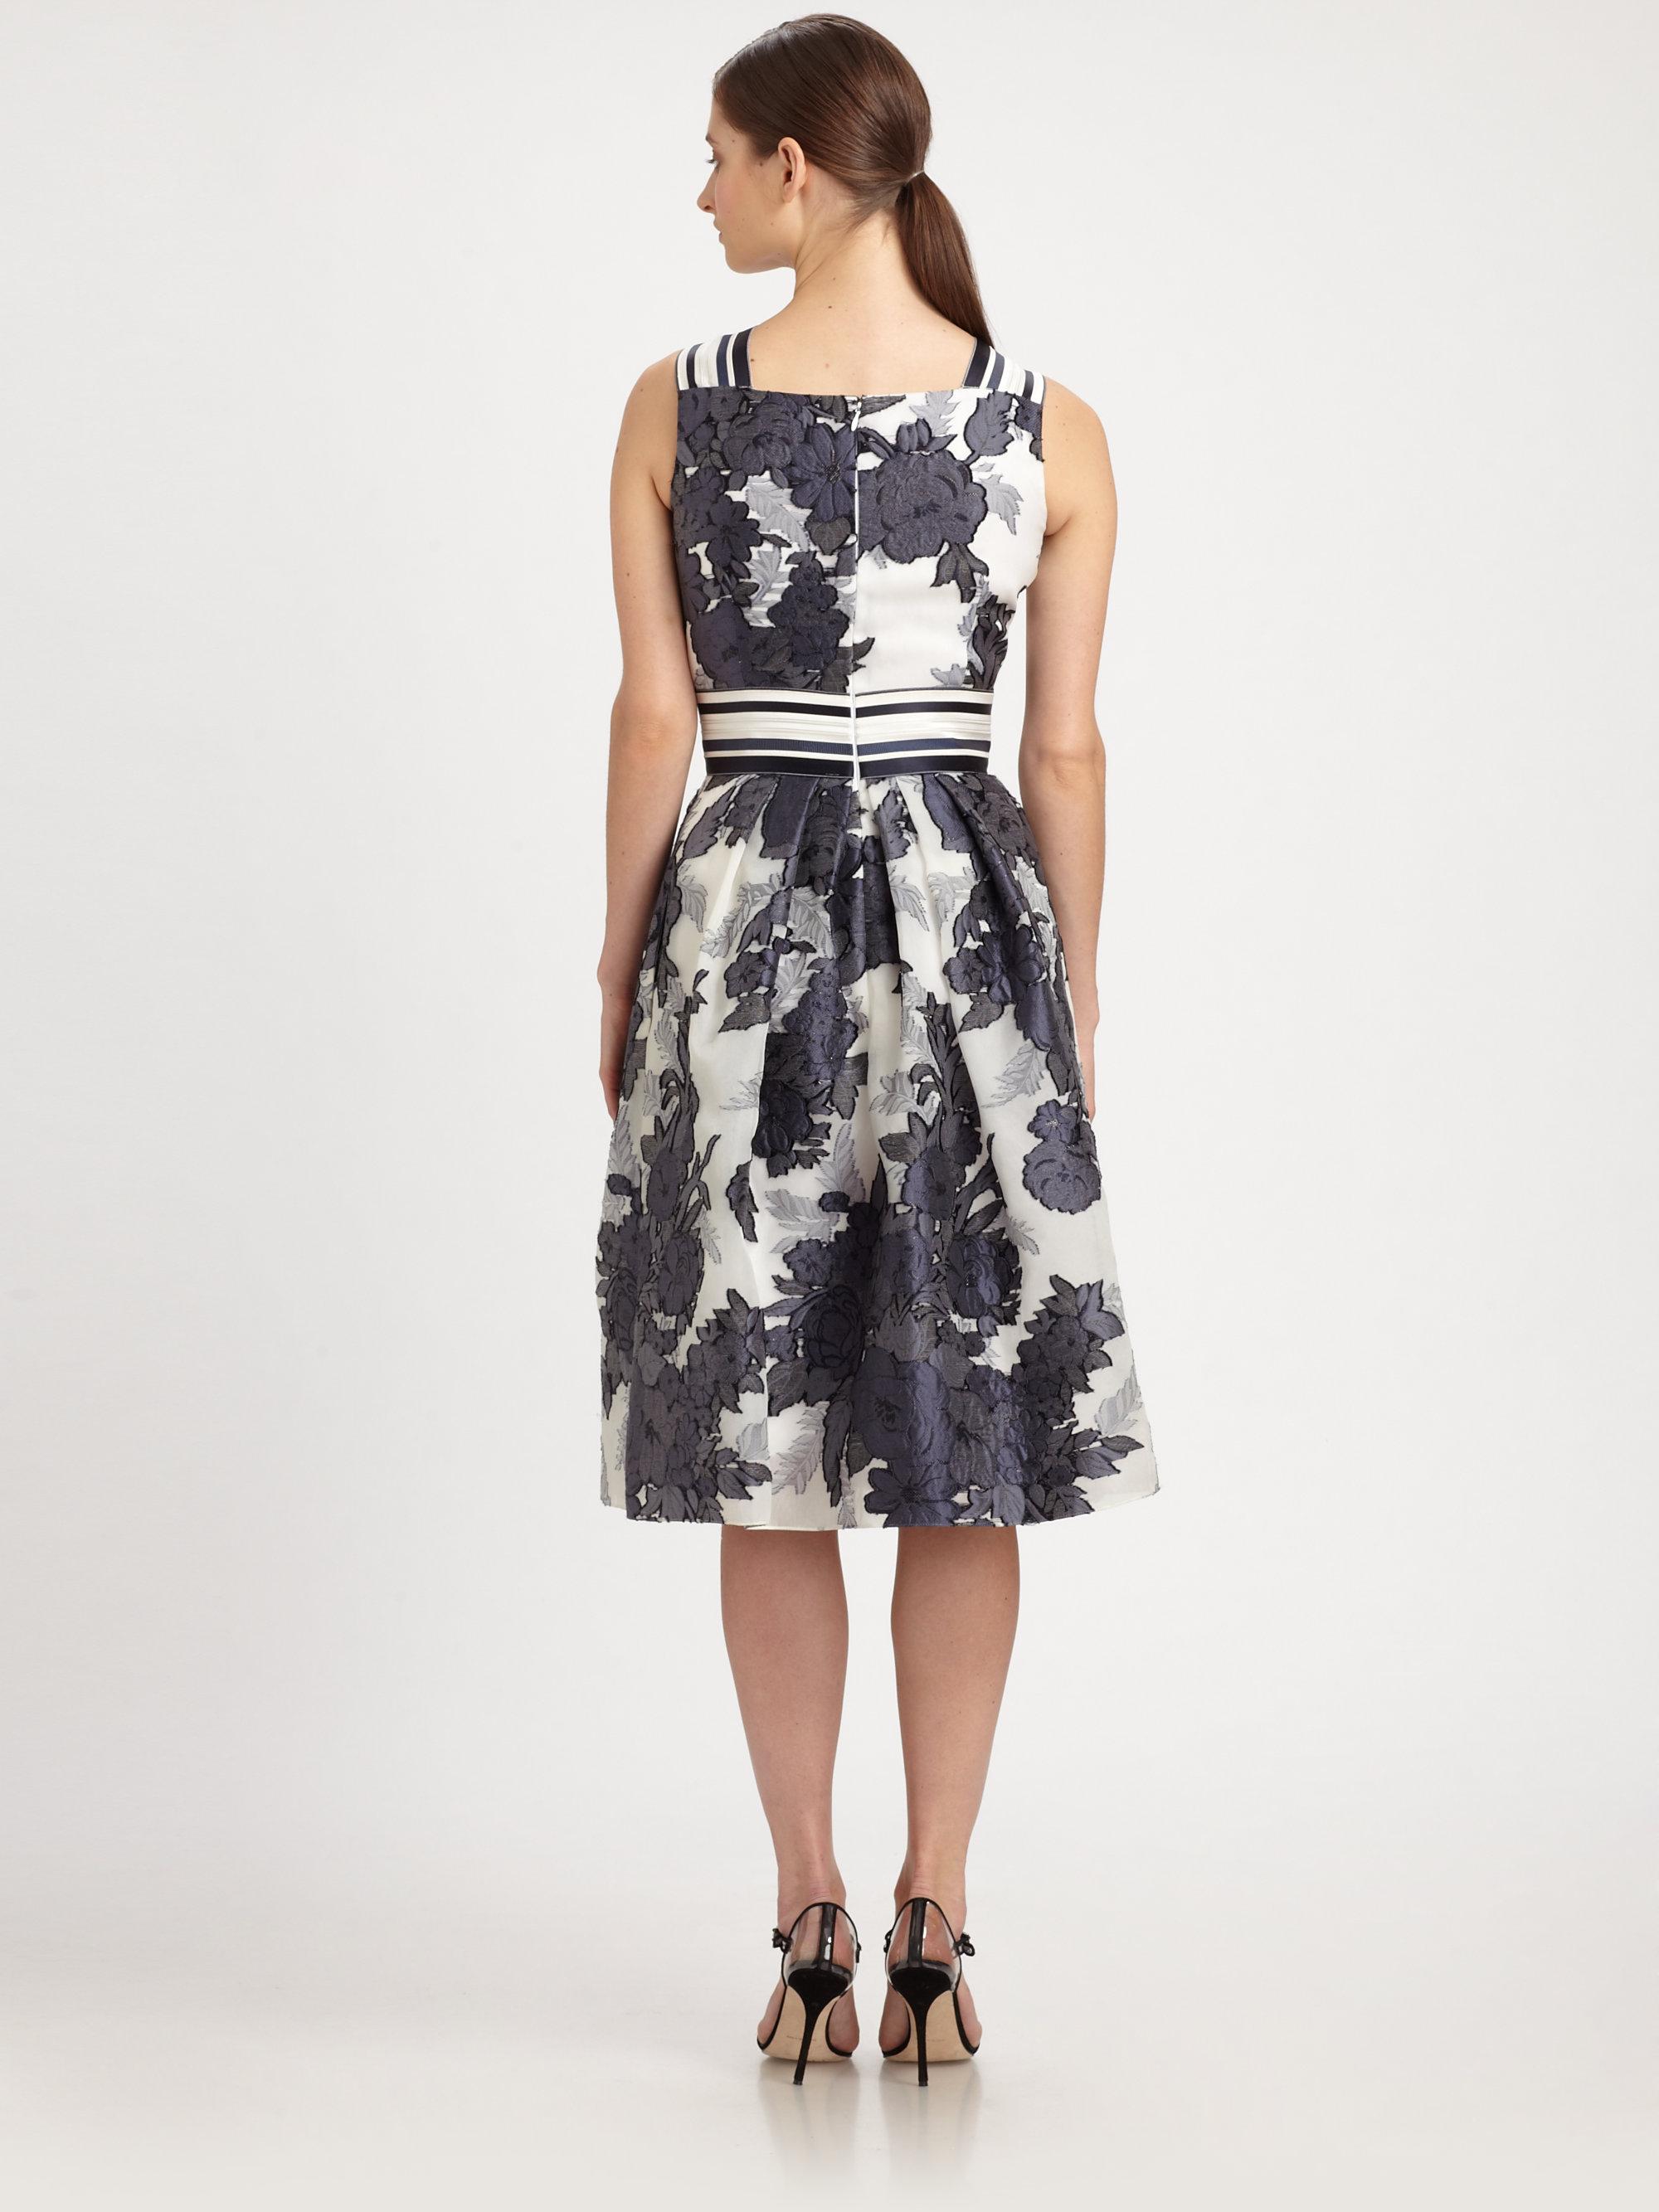 Lyst Carolina Herrera Floral Jacquard Dress In Blue